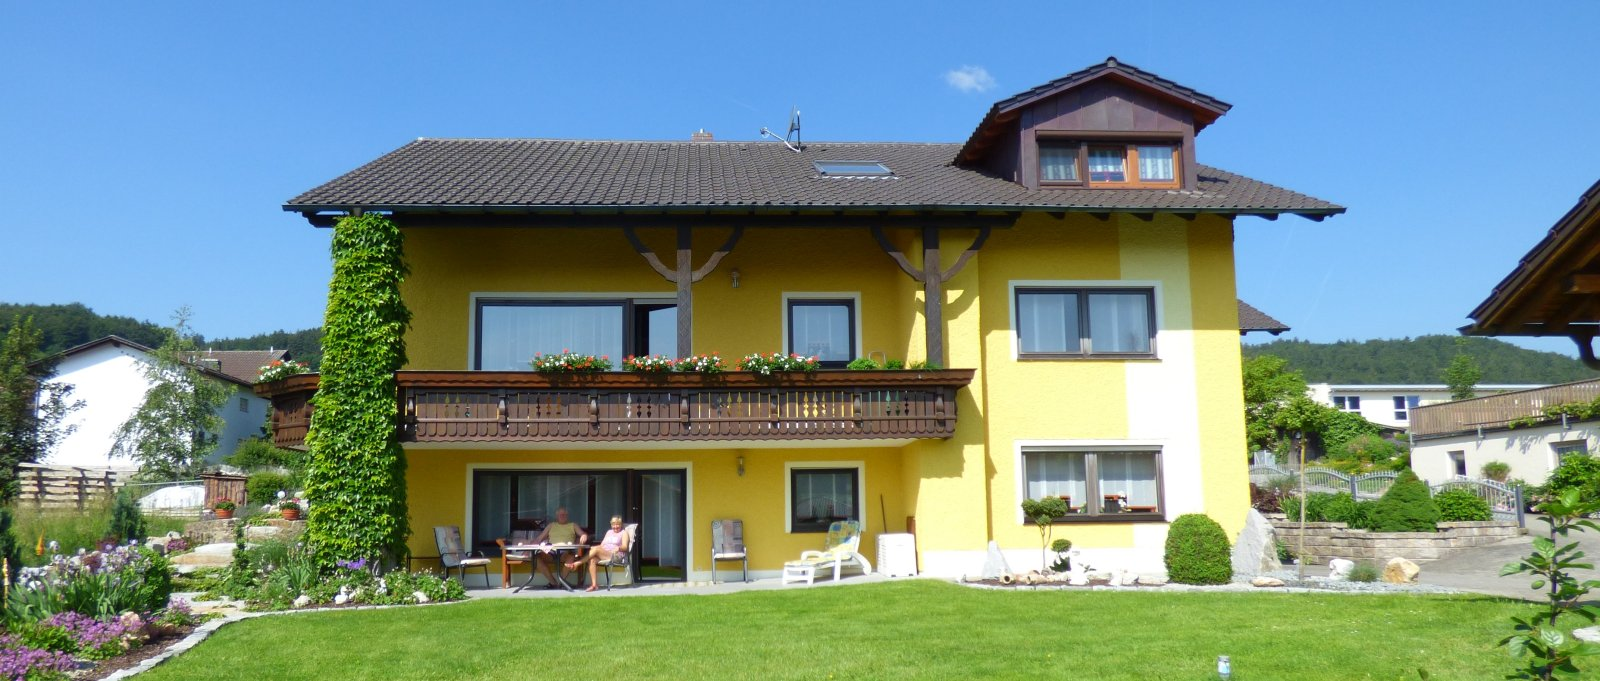 Landhaus Simon Gleißenberg Urlaub nahe dem Perlsee